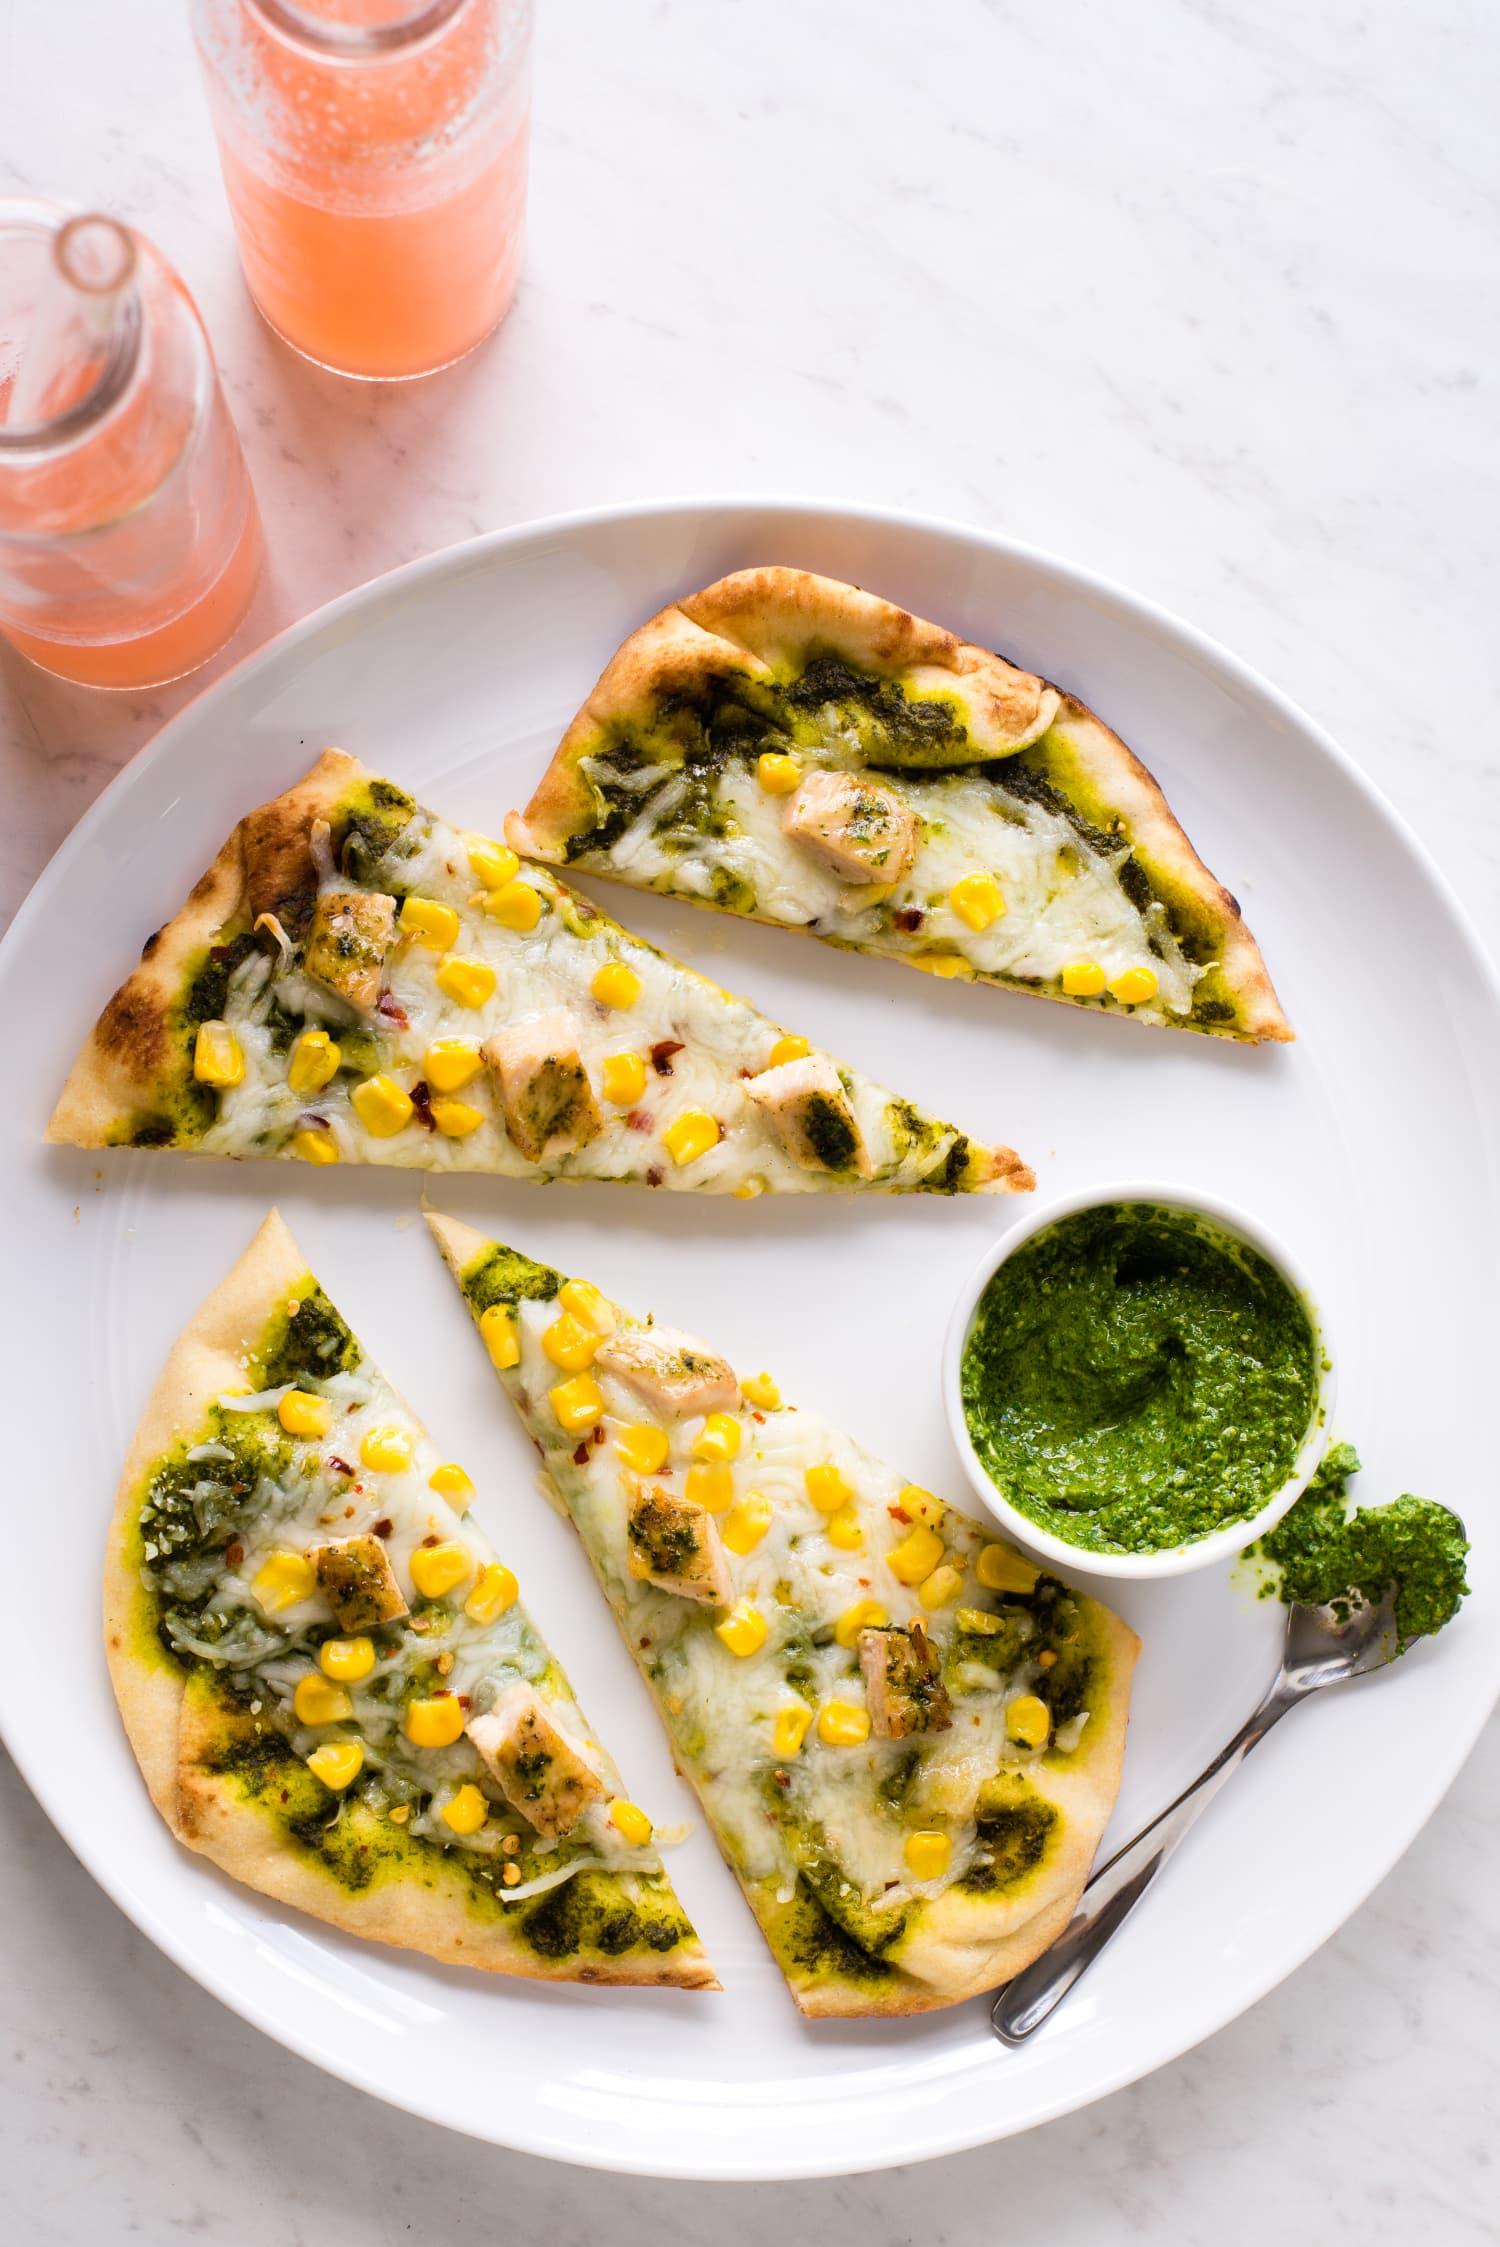 Recipe: Grilled Pesto Chicken Flatbreads